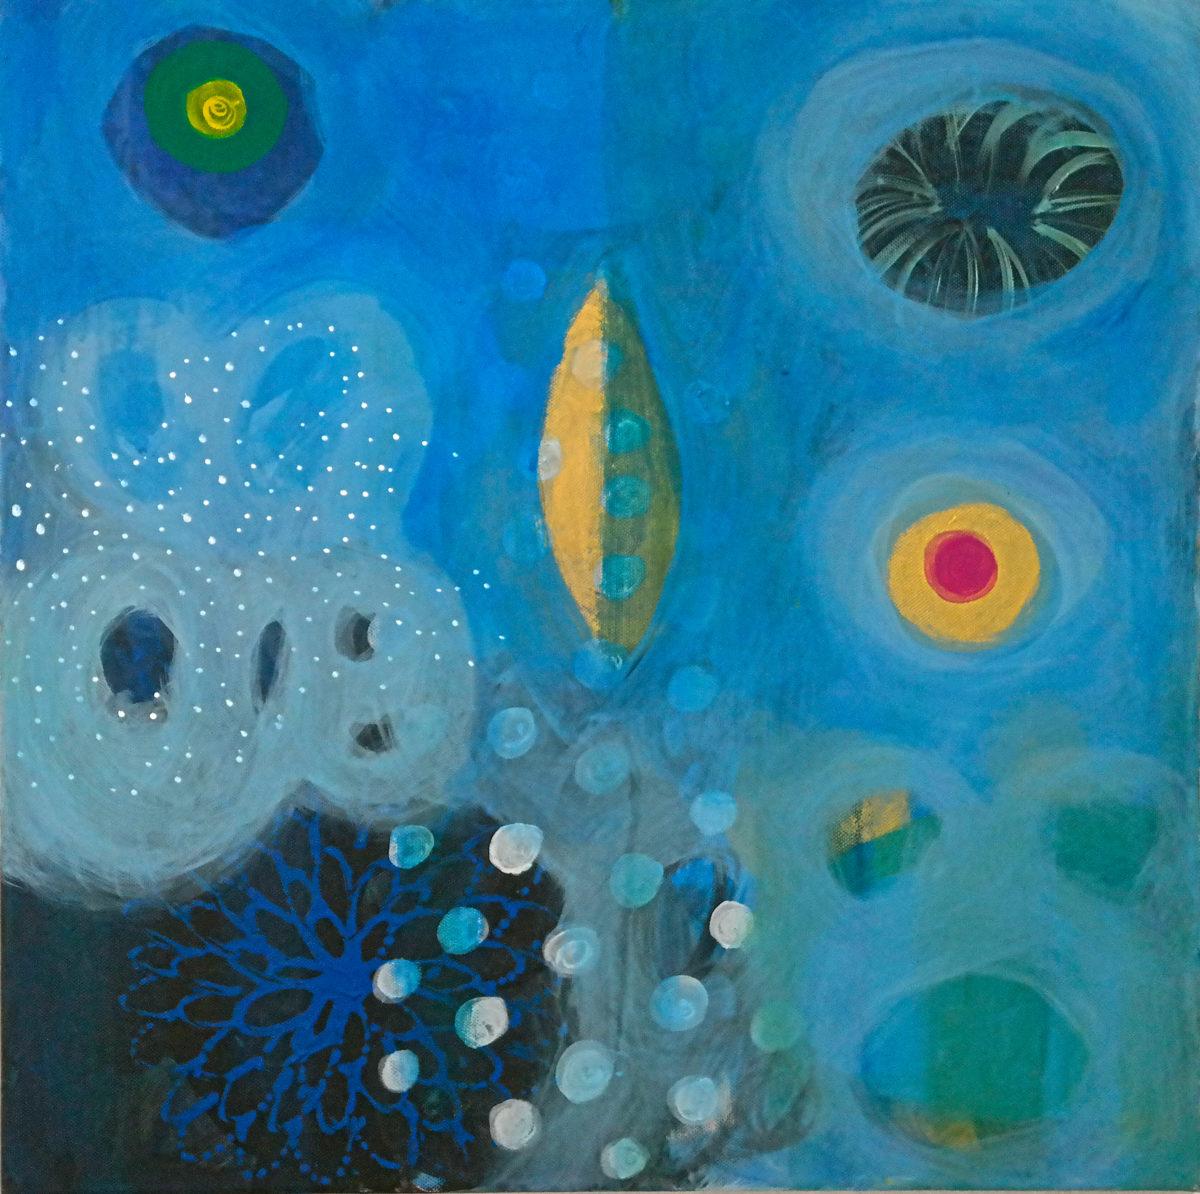 MVS, Spirit of Water 1 painting